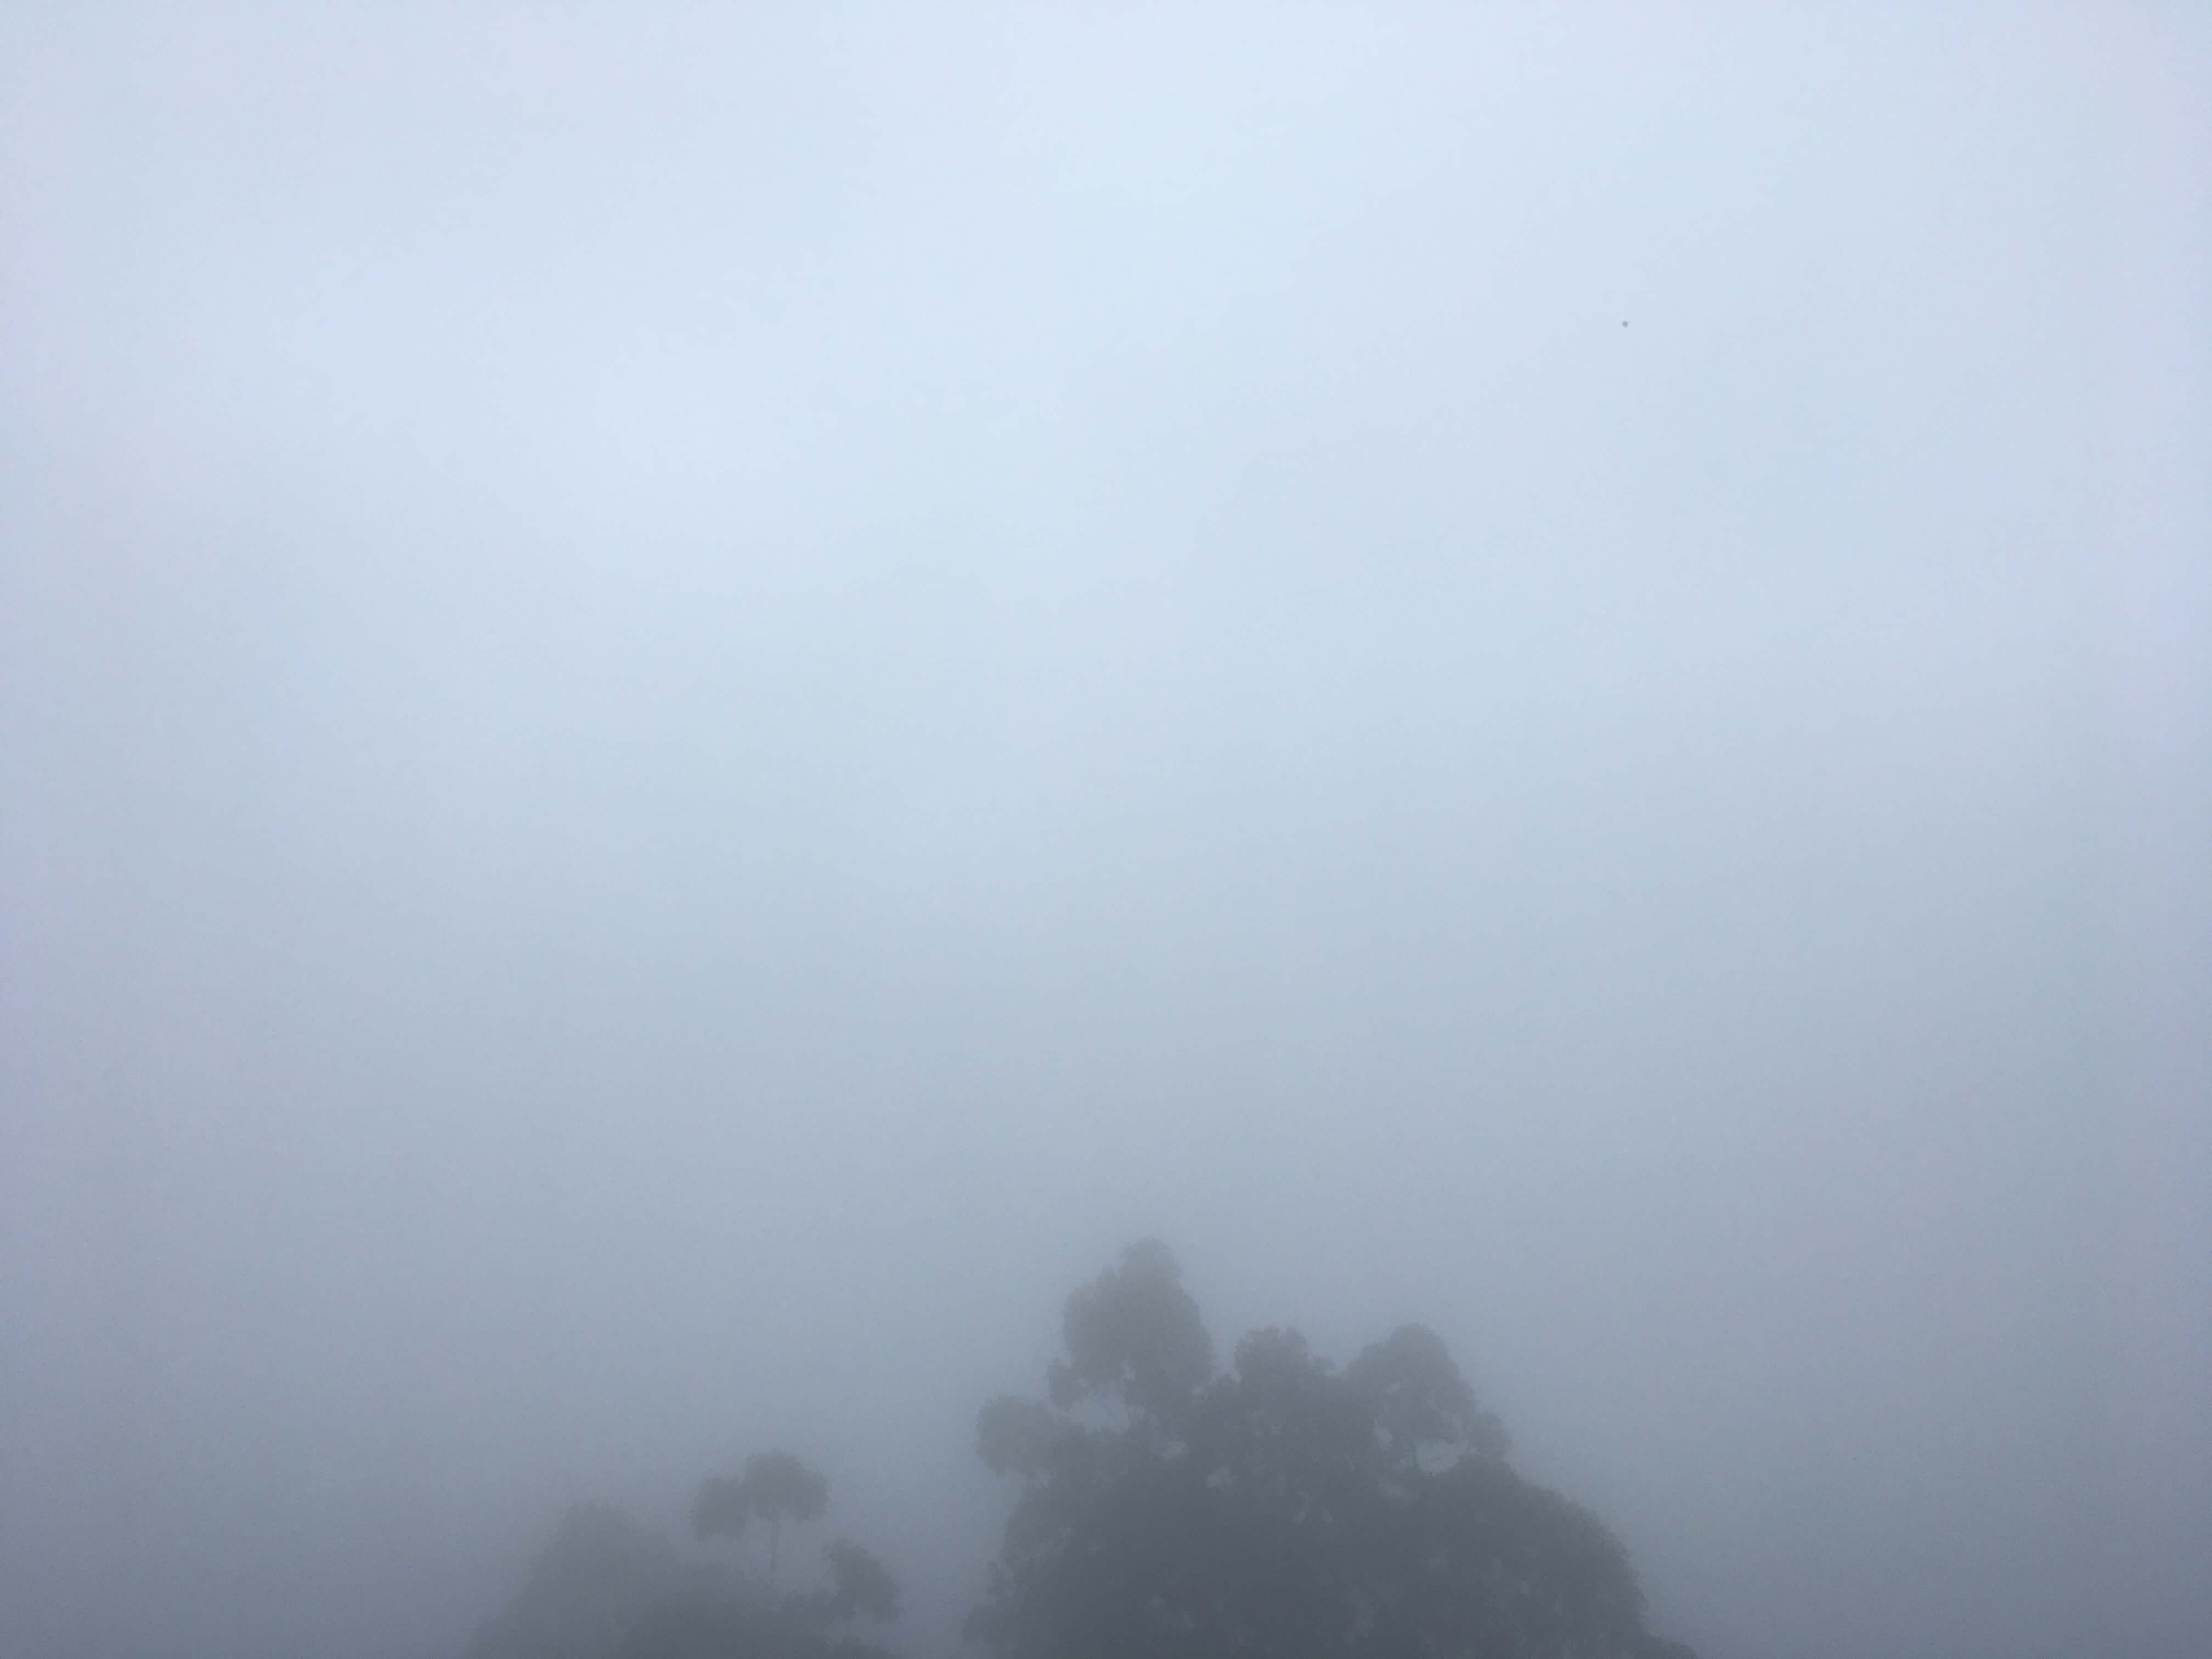 Foggy morning in Munnar